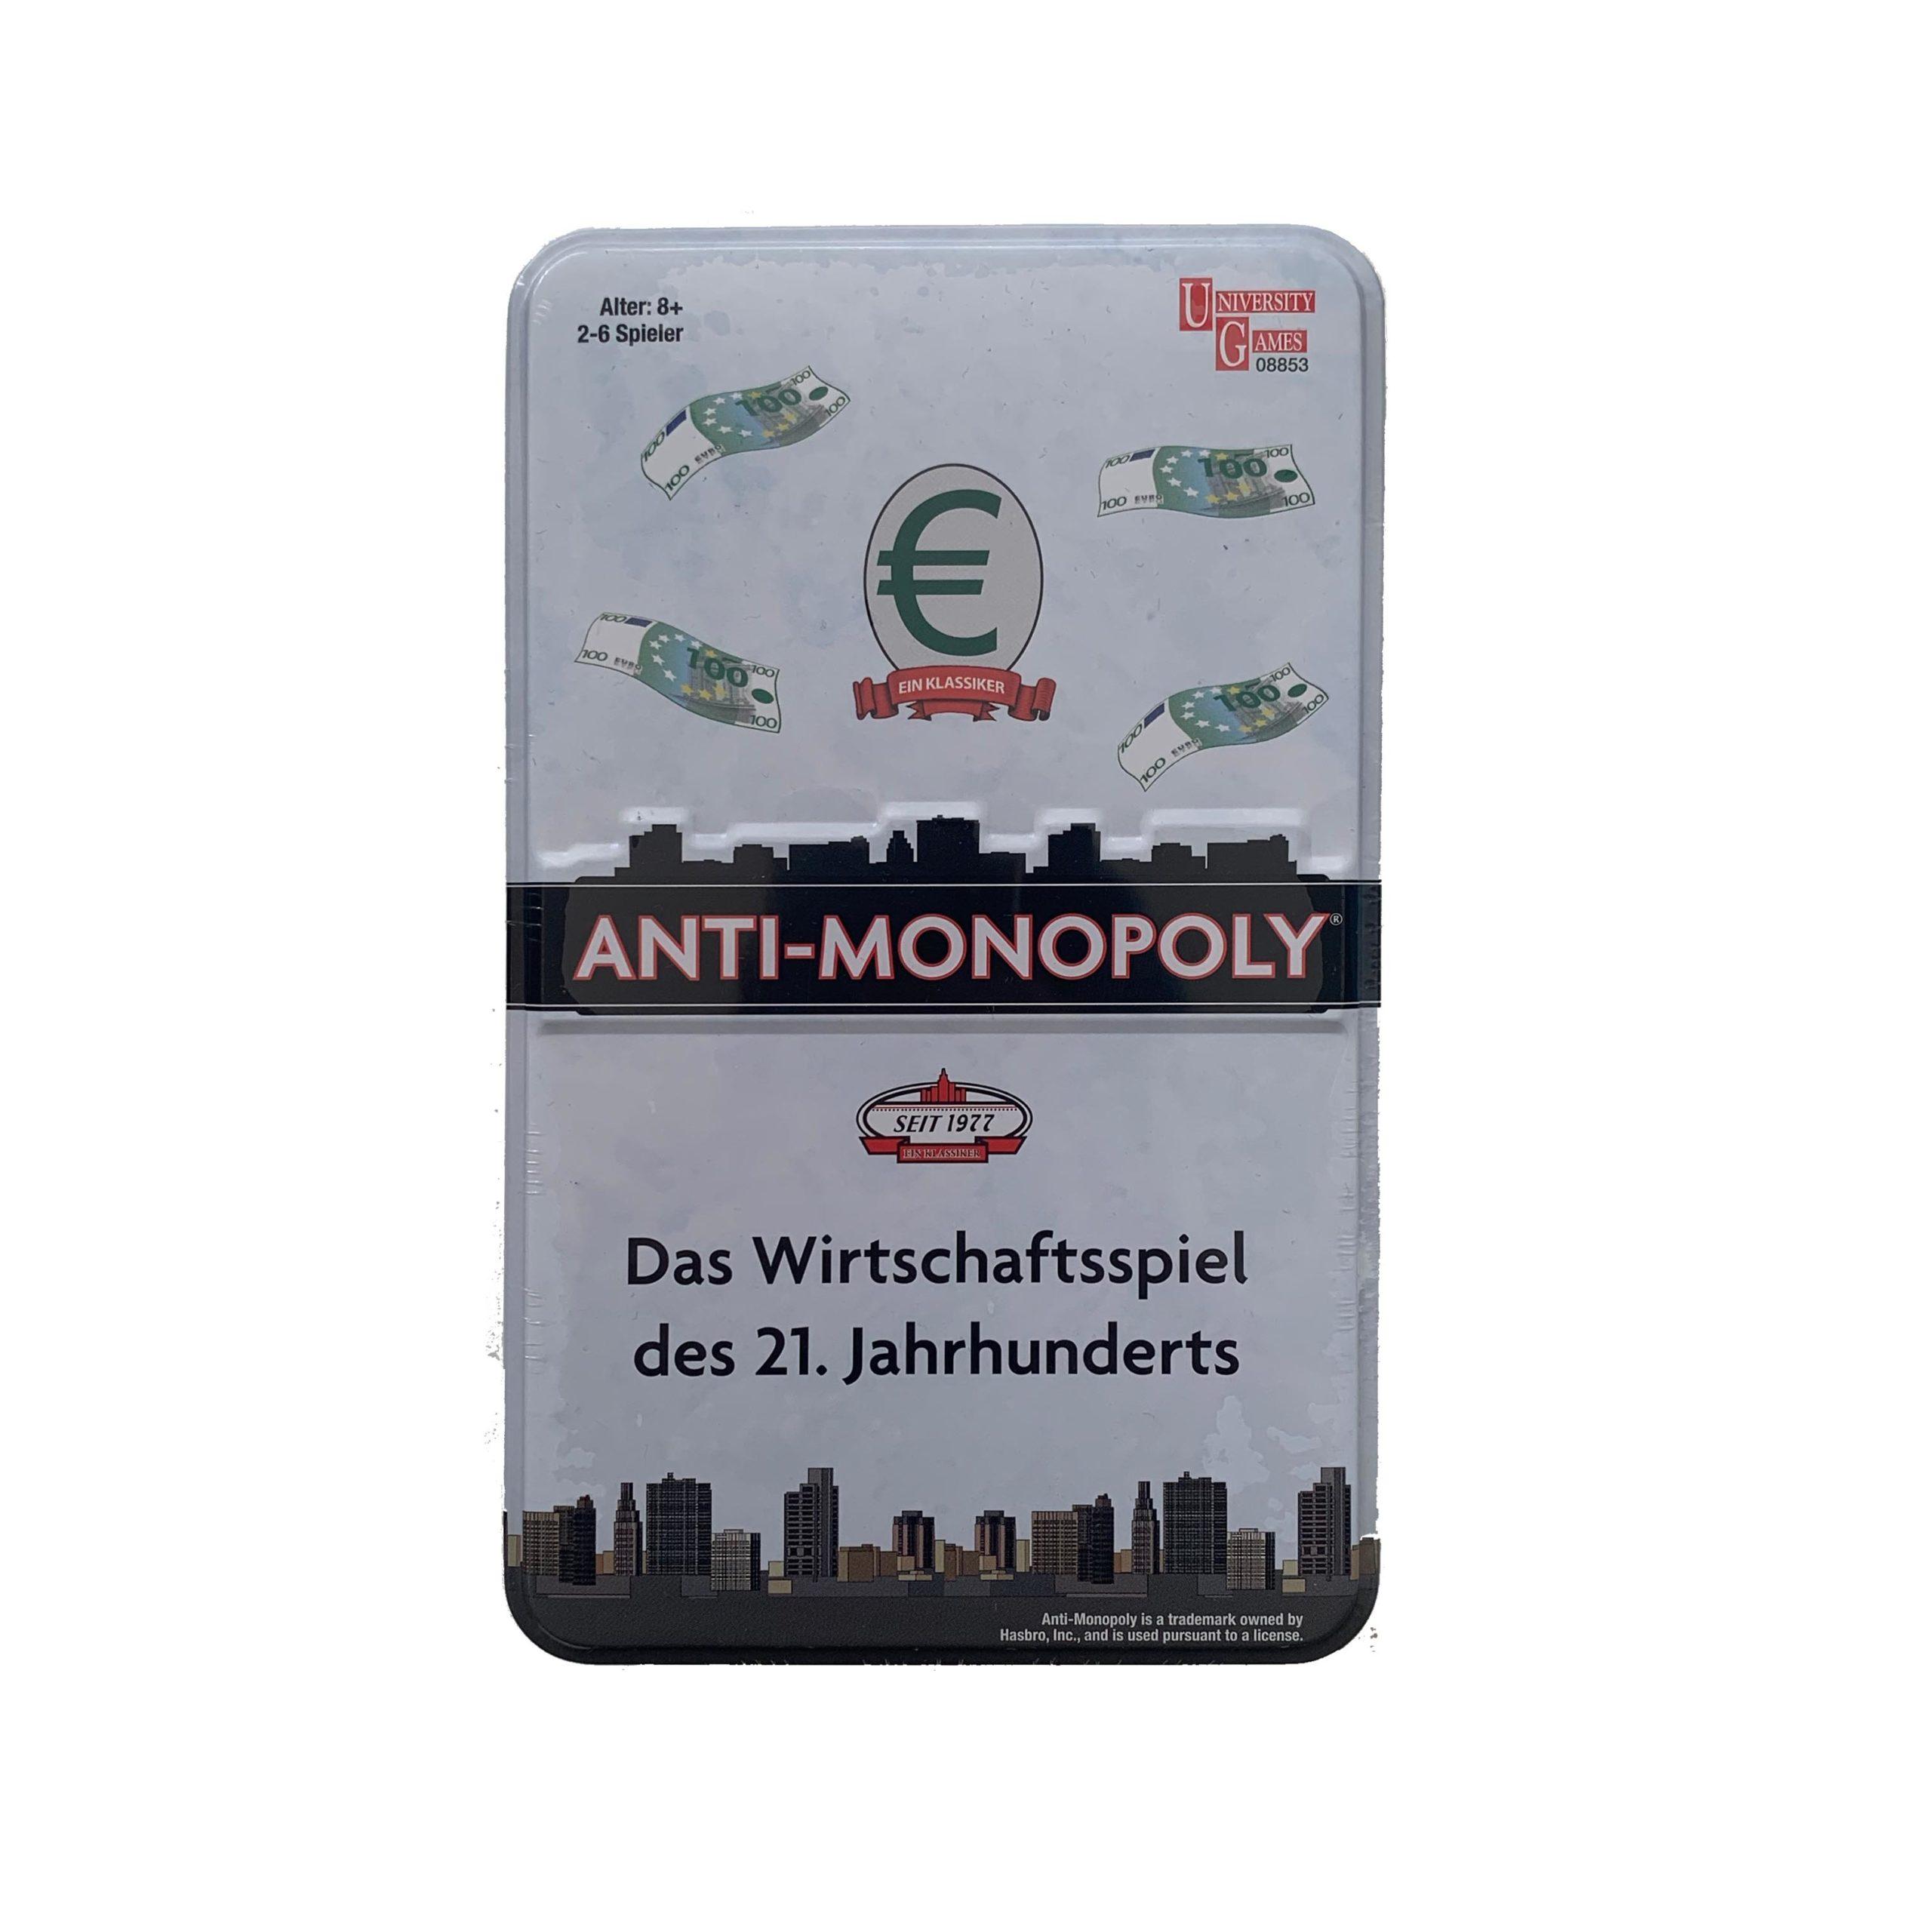 Anti Monopoly vorne